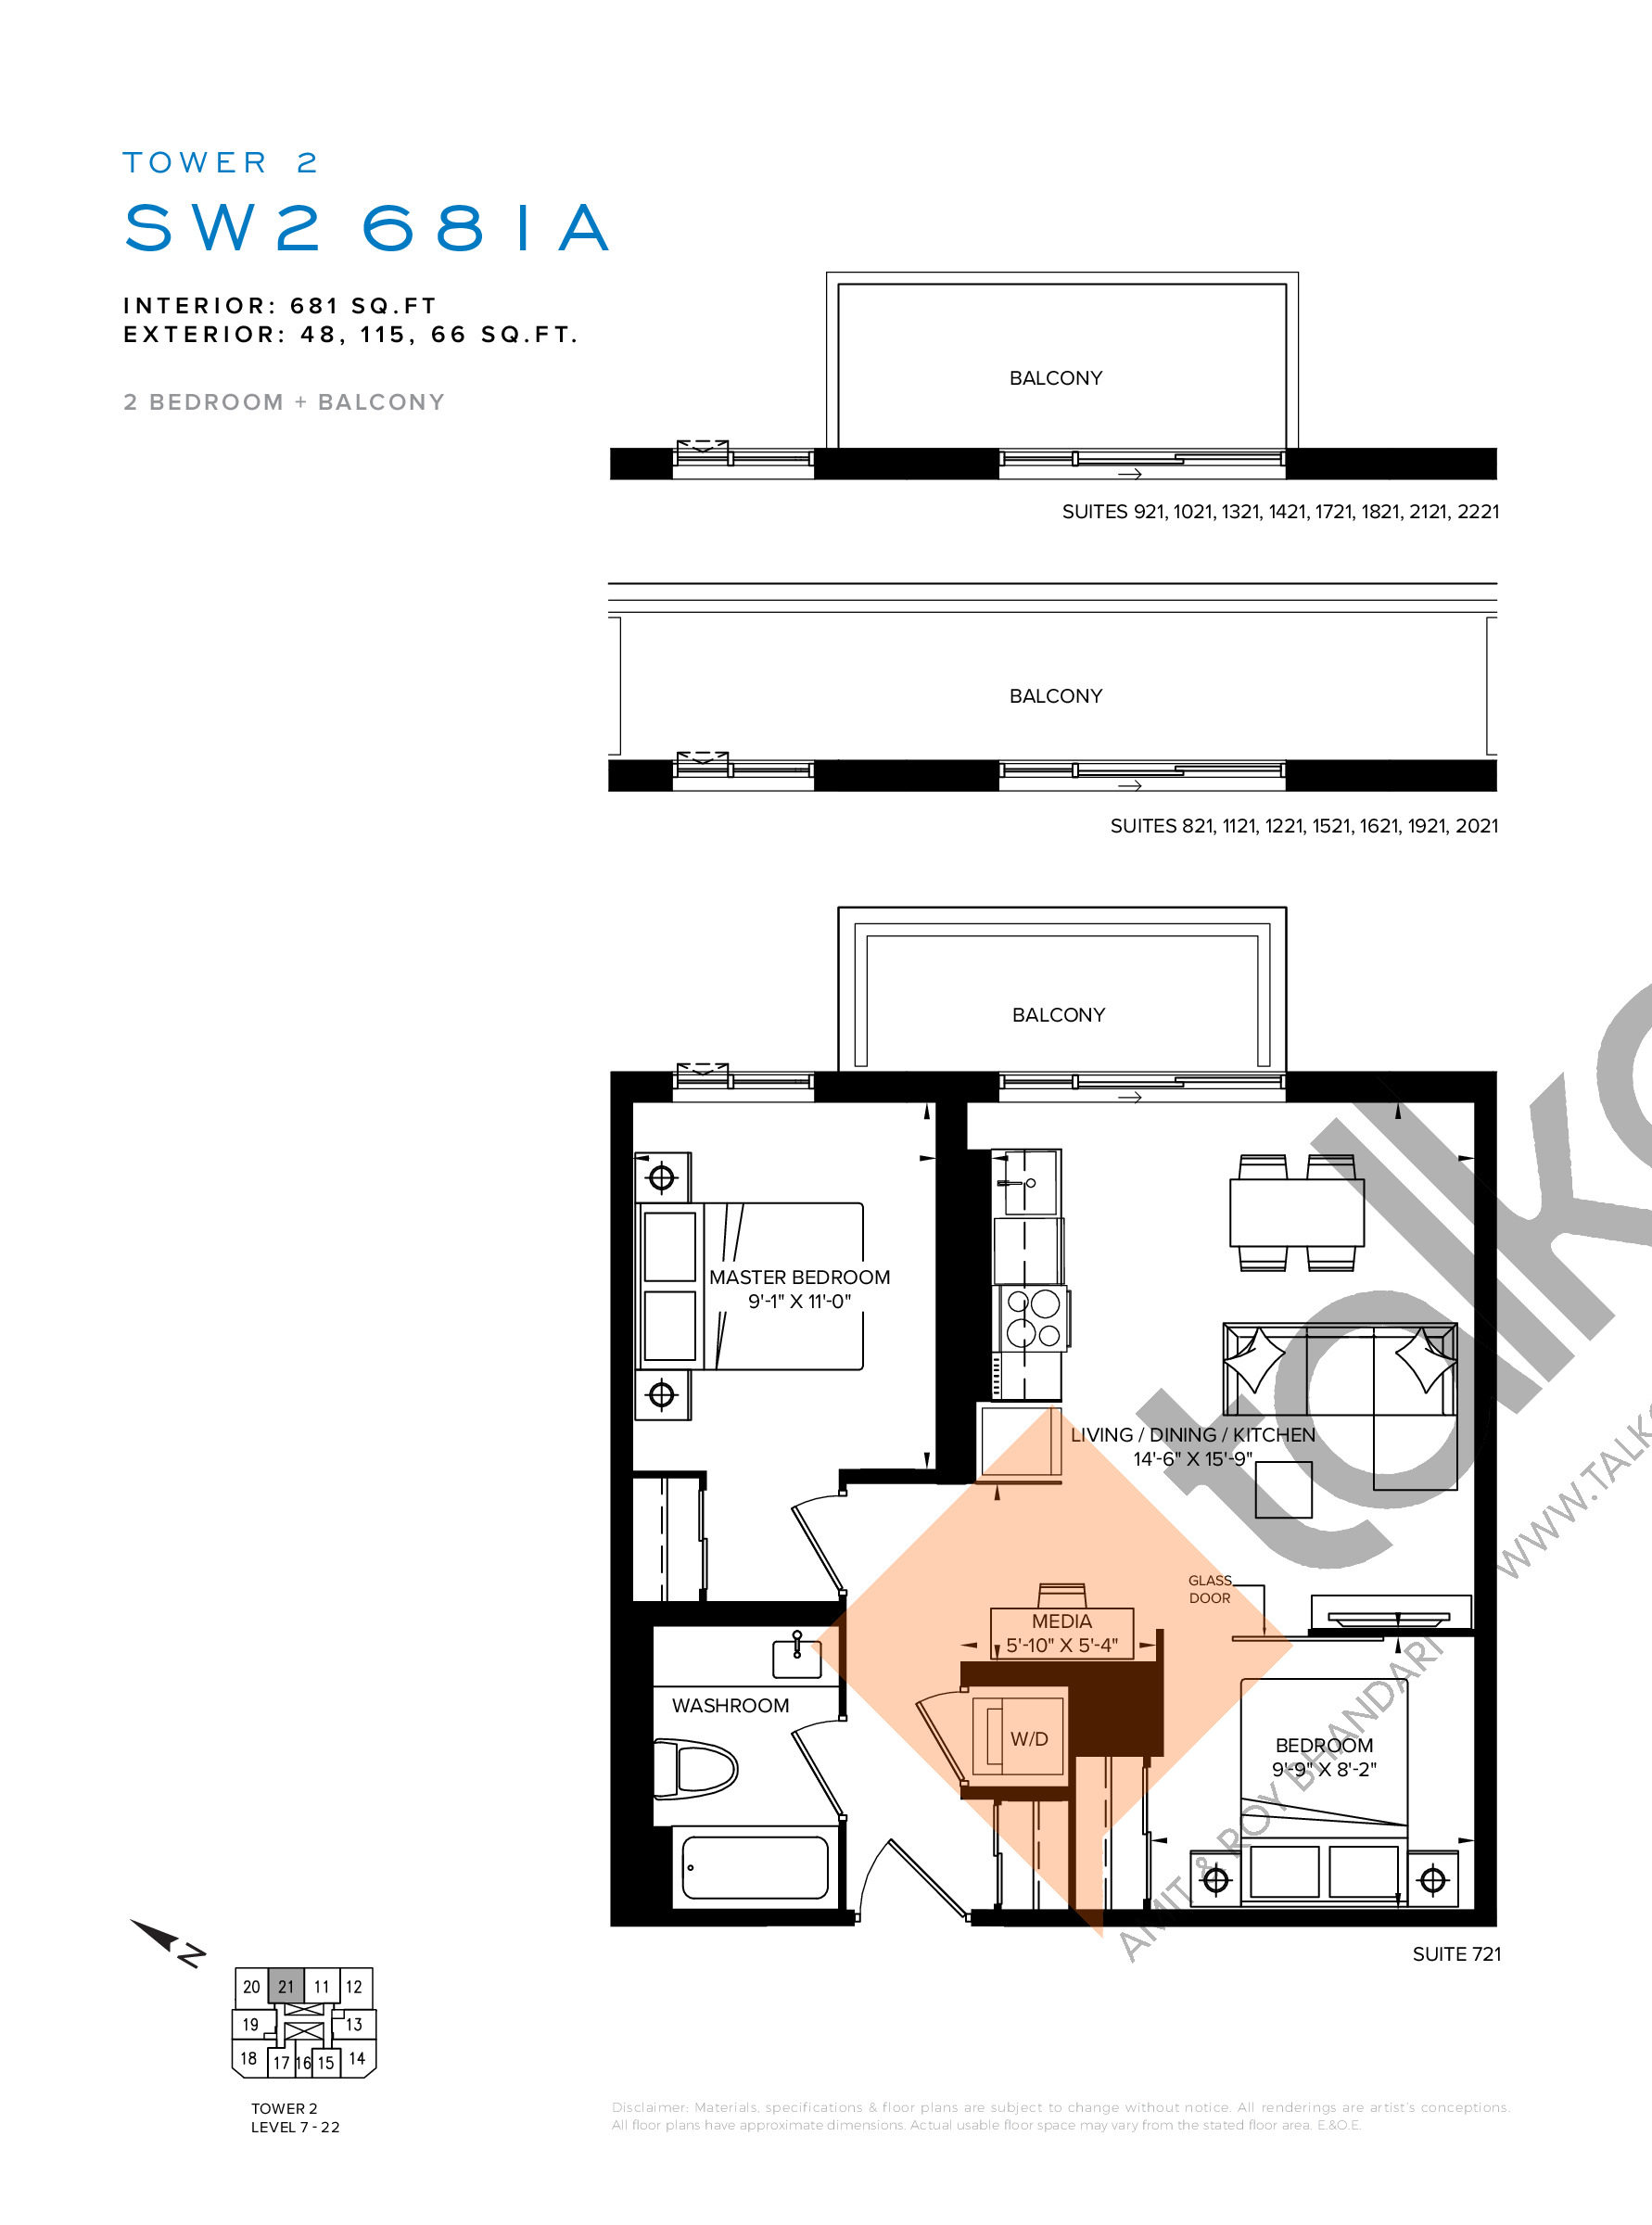 SW2 681A Floor Plan at SXSW Tower 2 Condos (SXSW2) - 681 sq.ft